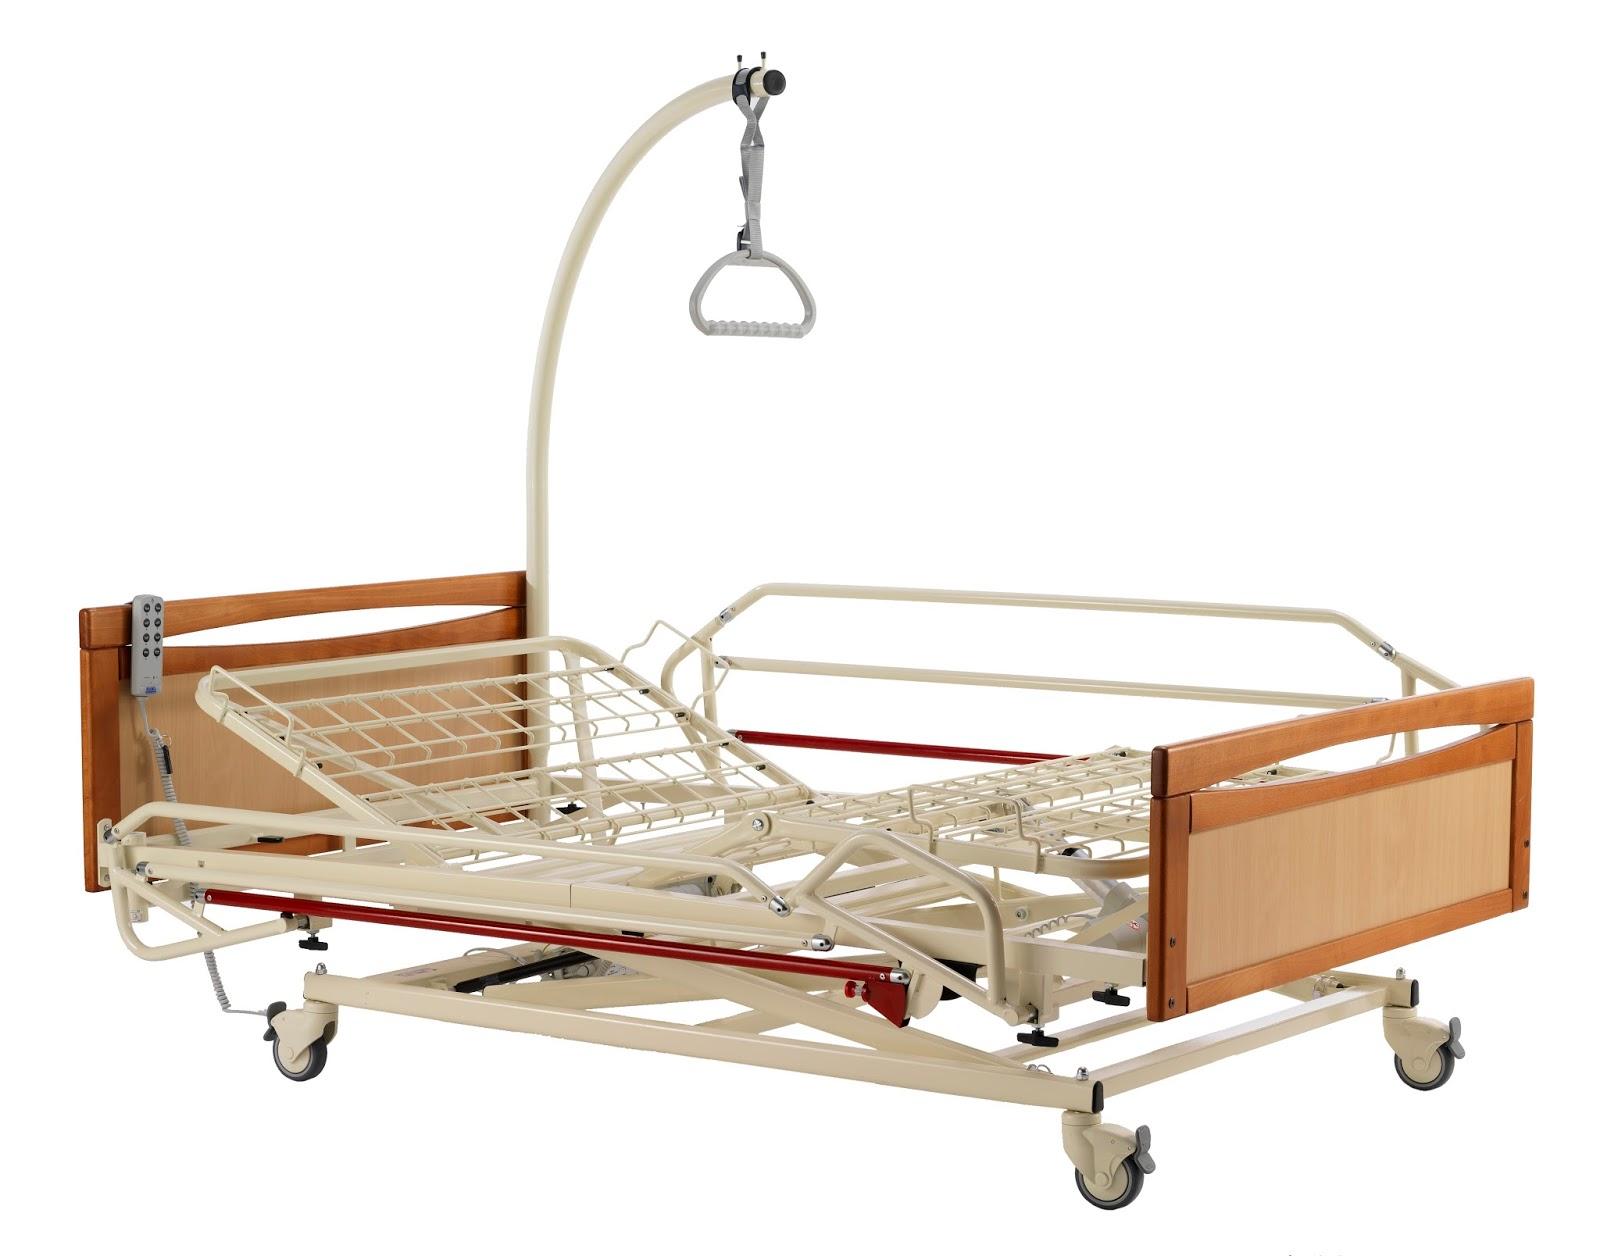 le comptoir m dical 09 53 74 01 24. Black Bedroom Furniture Sets. Home Design Ideas